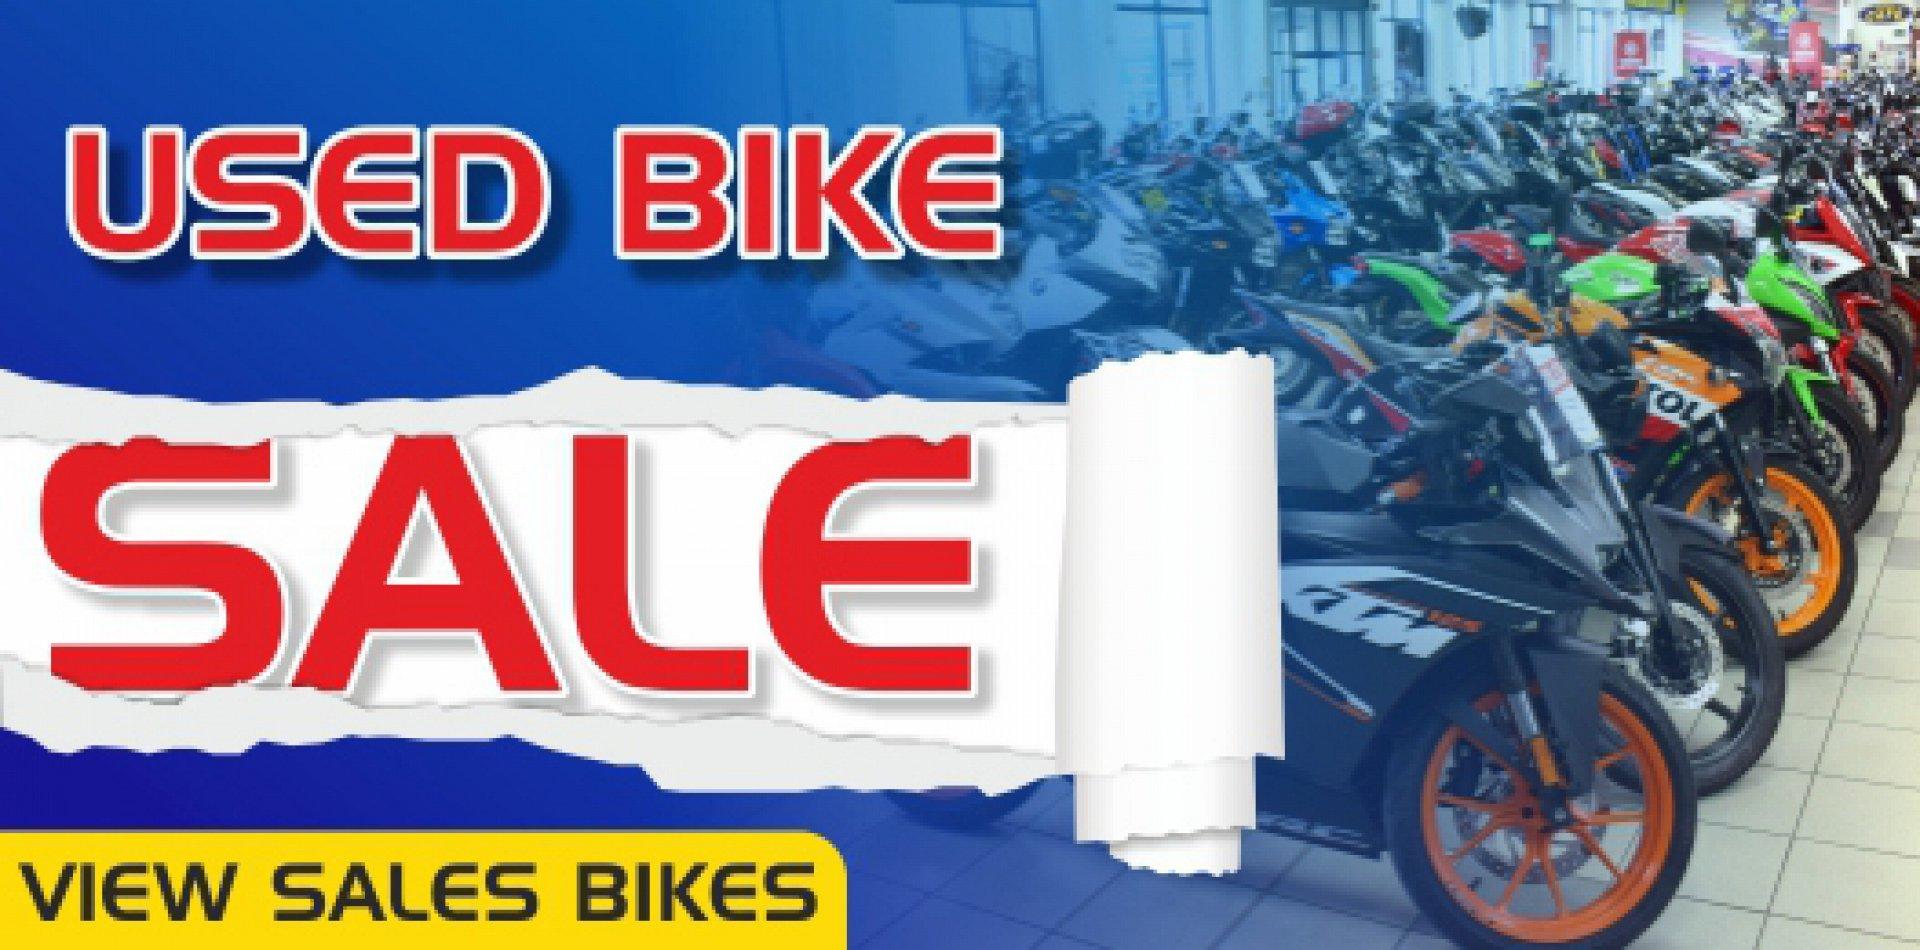 Used Harley Davidson bikes for sale